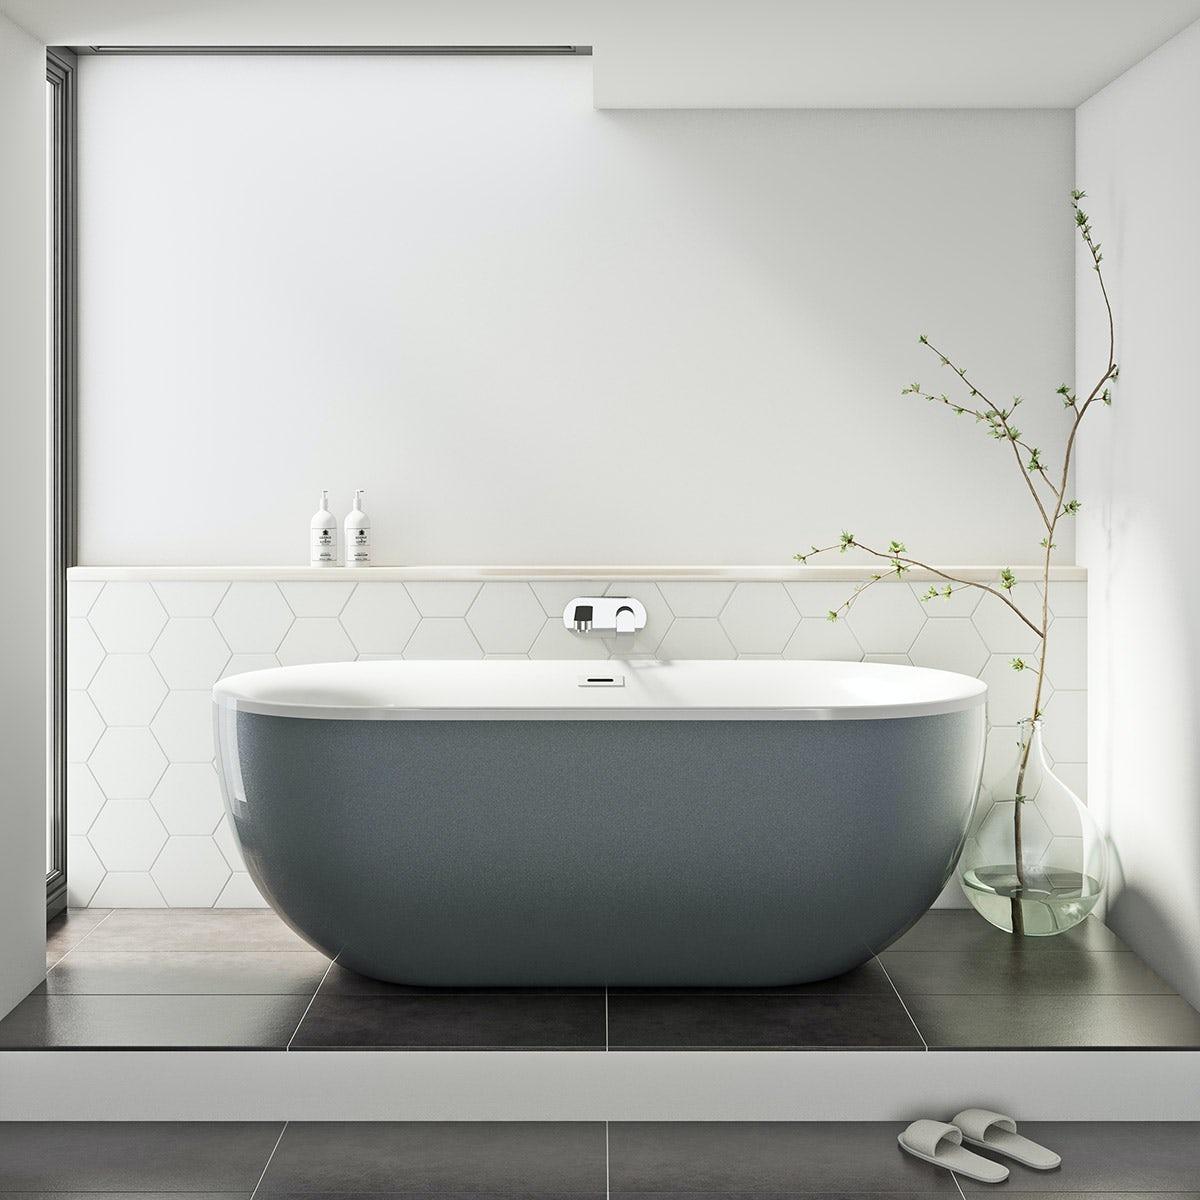 Ellis storm coloured freestanding bath